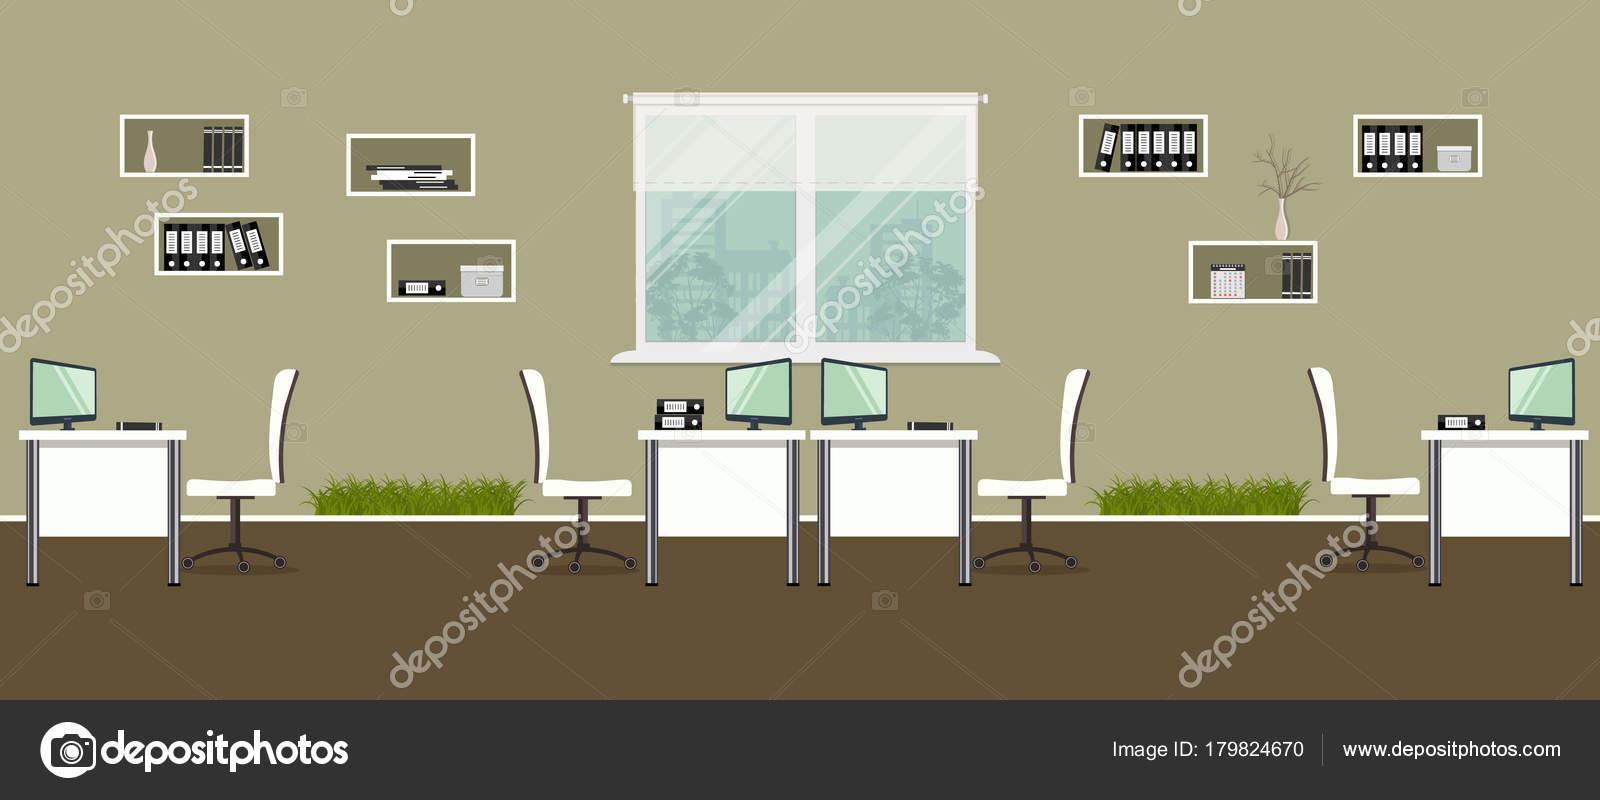 office decorative. Modern Office White Furniture Decorative Grass Desks Chairs Shelves Documents \u2014 Stock Vector